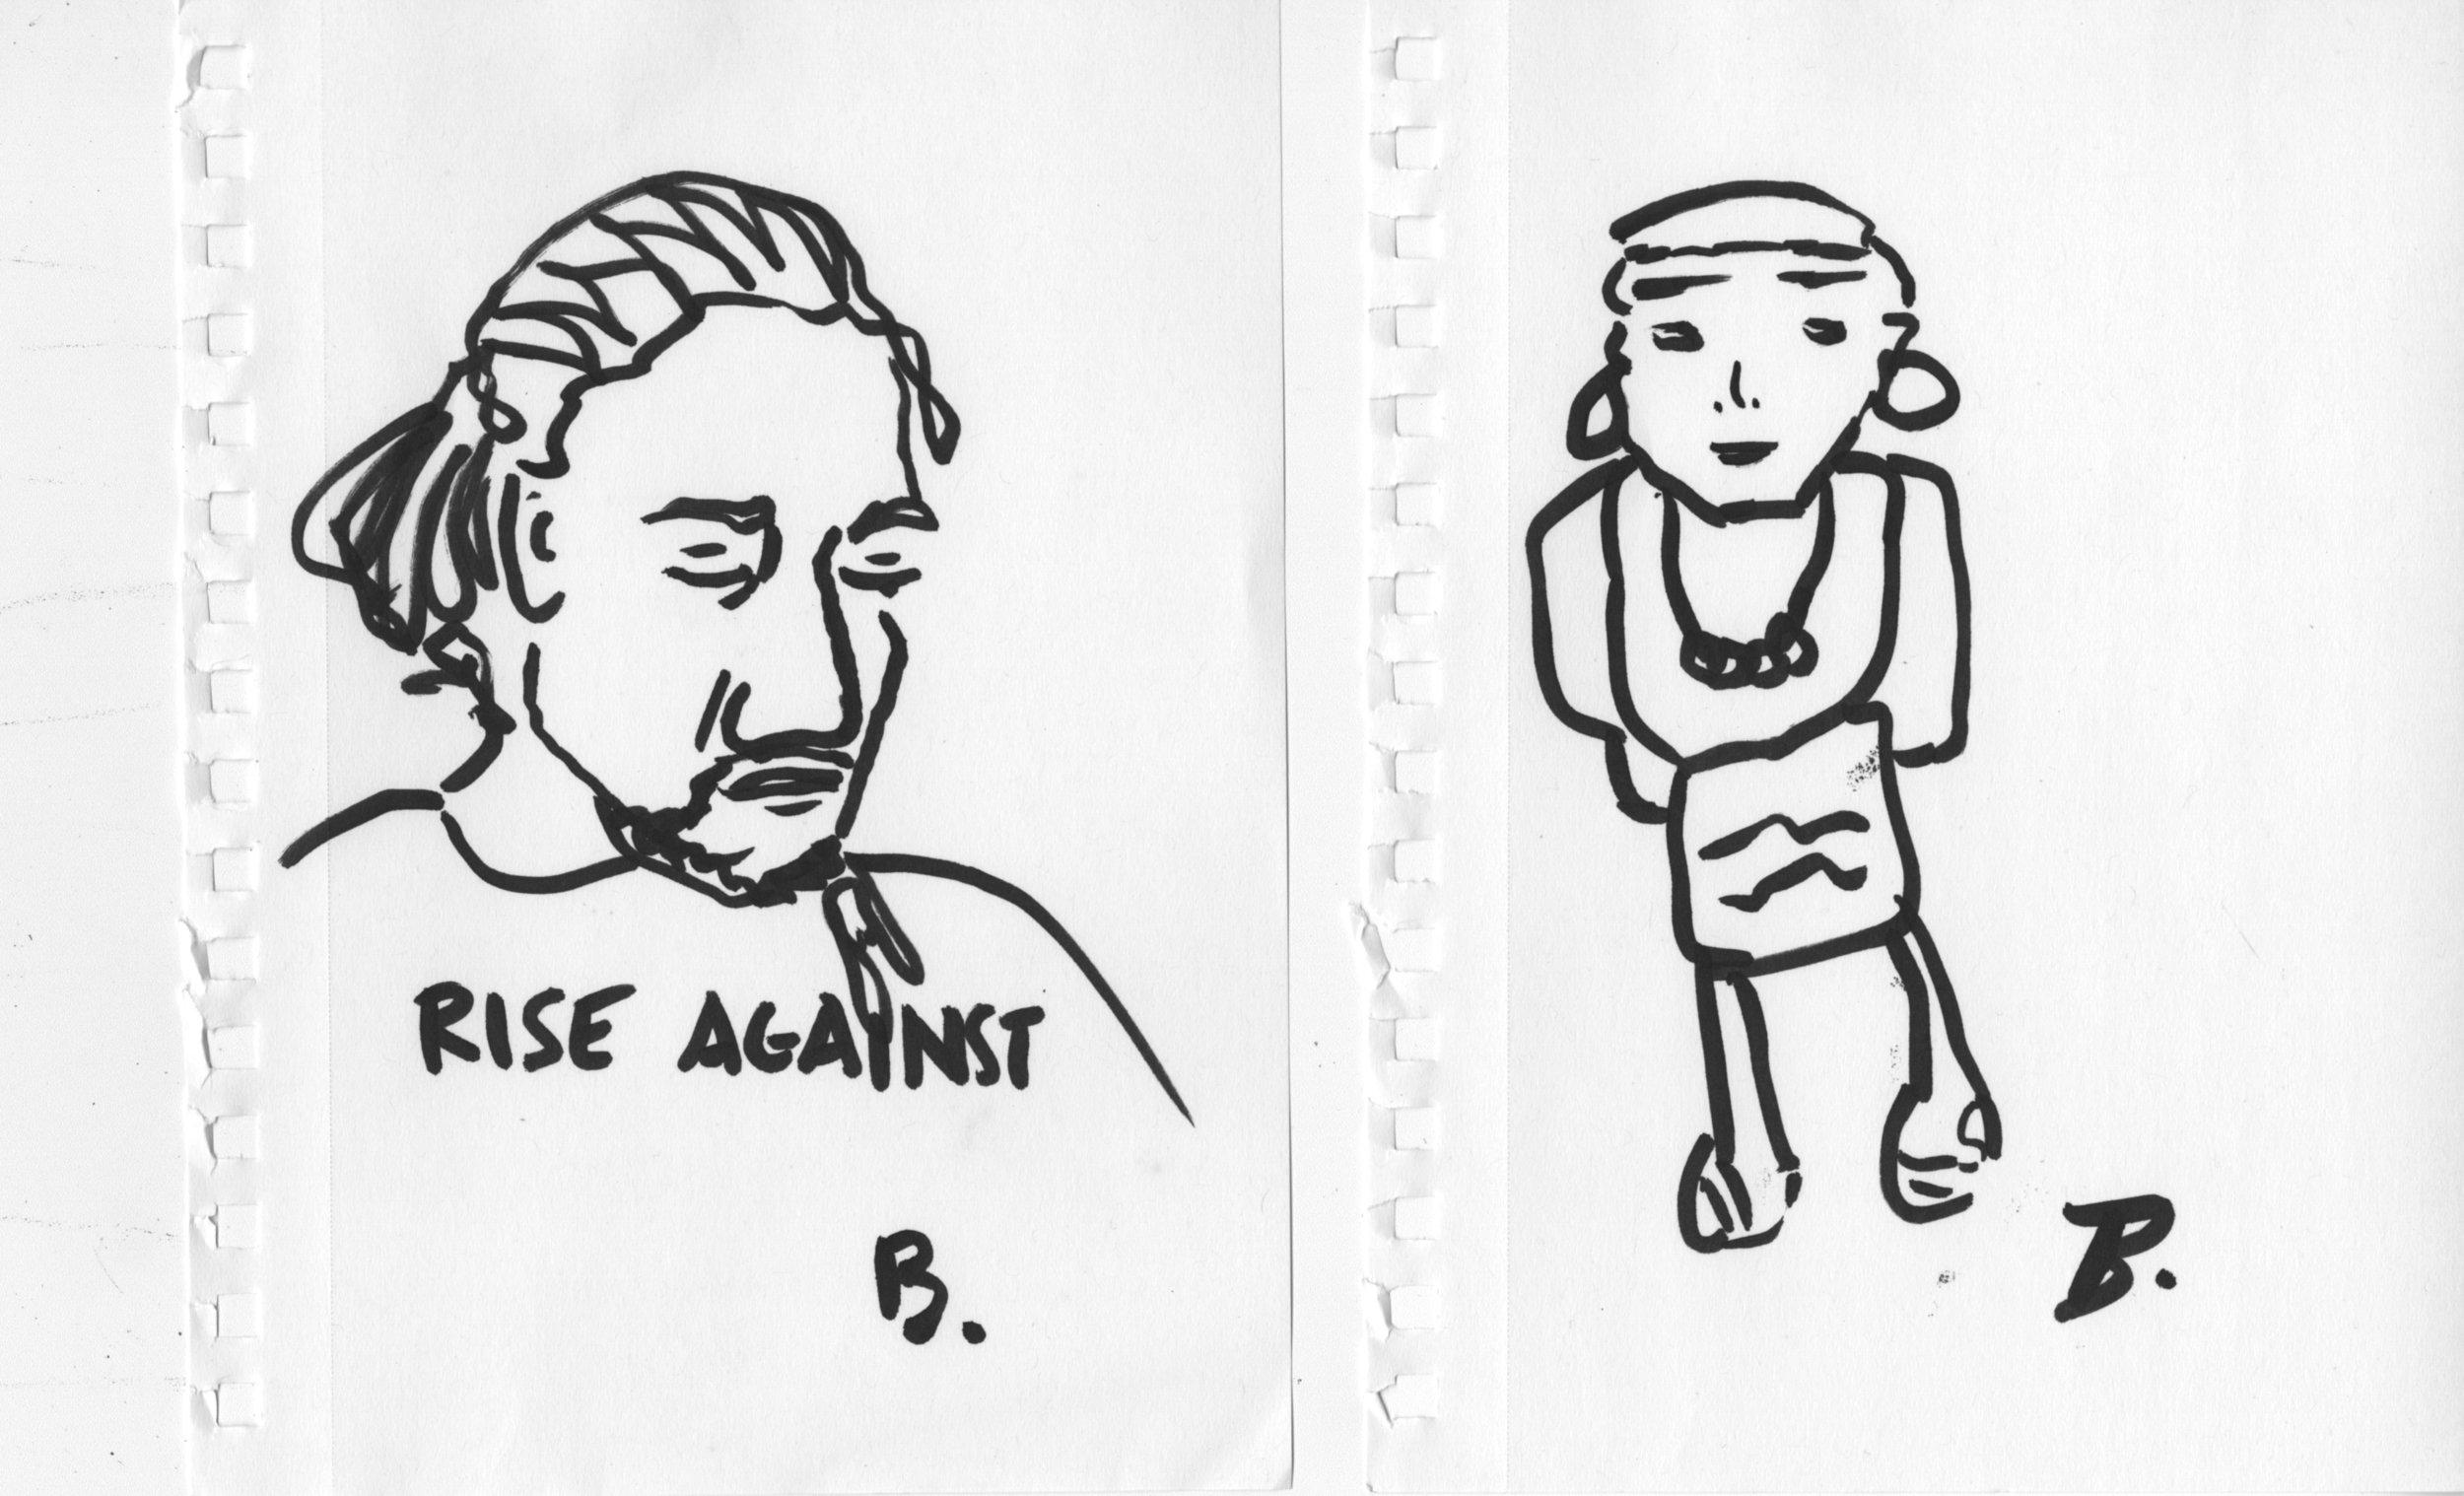 19_B_Rise Against.jpg